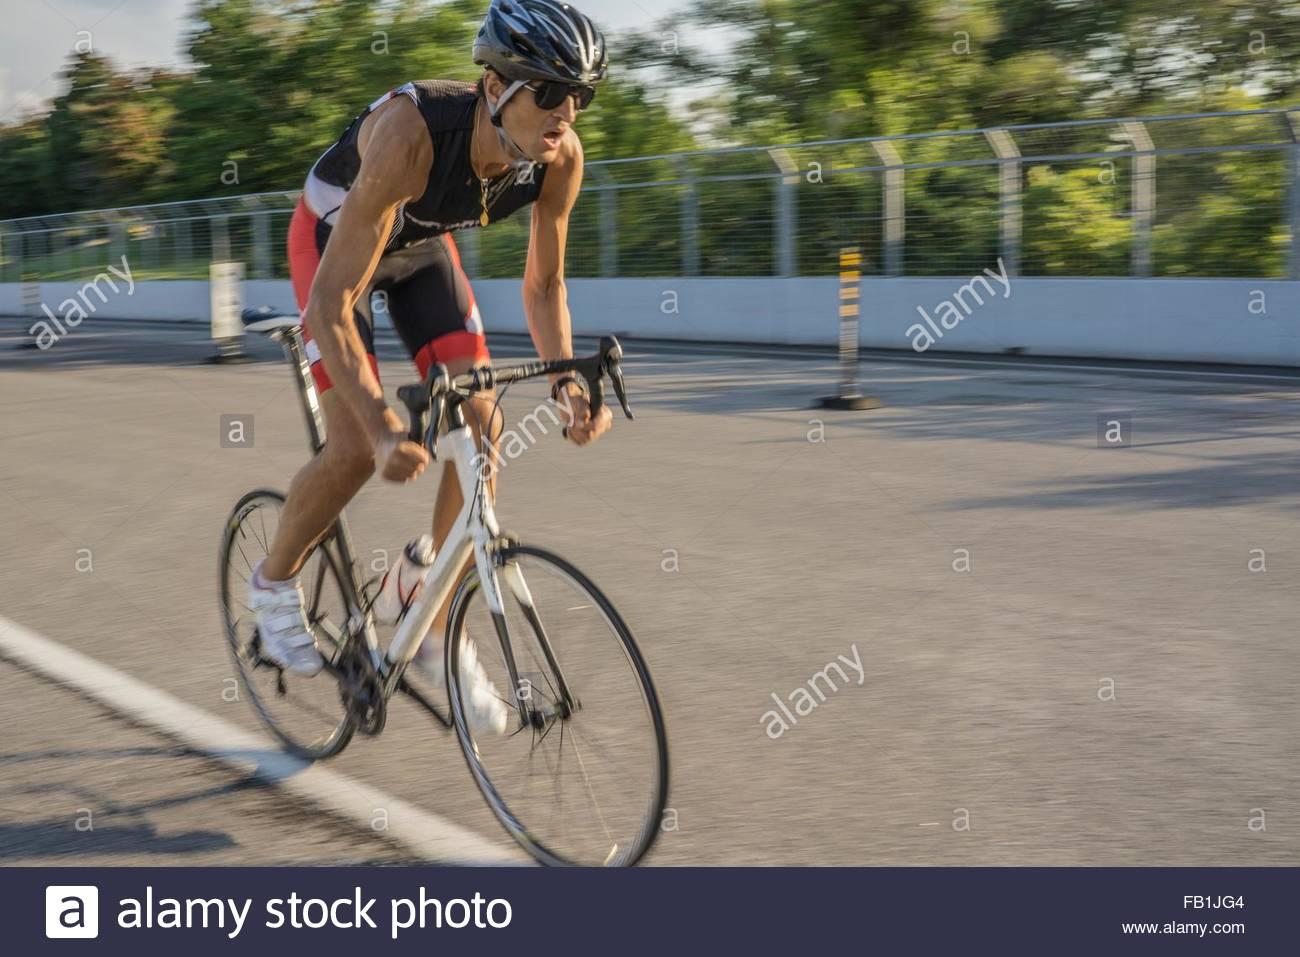 Mitad hombre adulto ciclismo en mountain bike en Race Track, rebabas motion, Montreal, Quebec, Canadá Imagen De Stock